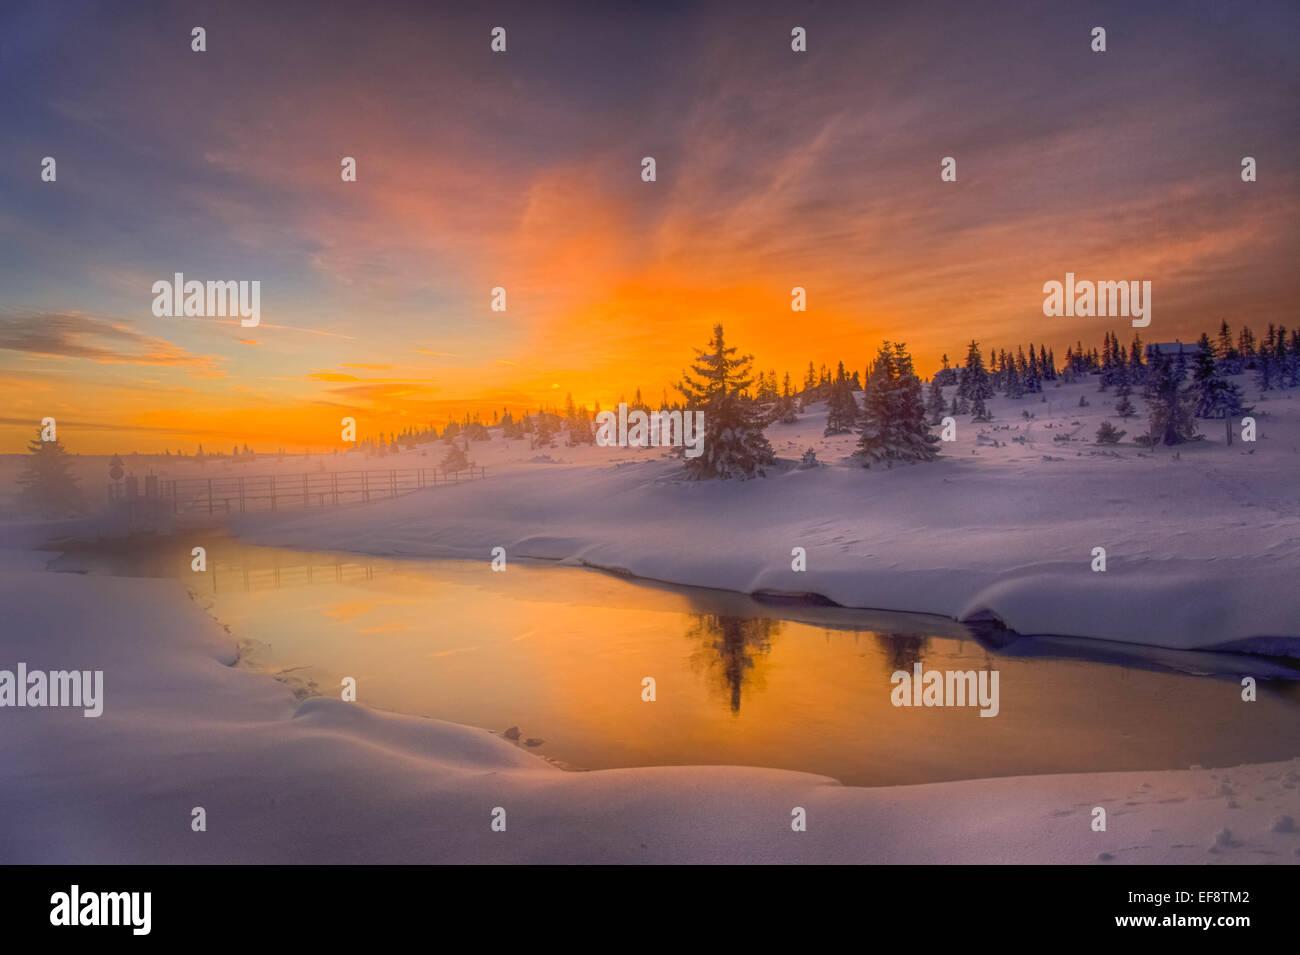 Norwegen, Namsos, Winterlandschaft mit Nebel bei Sonnenaufgang Stockbild